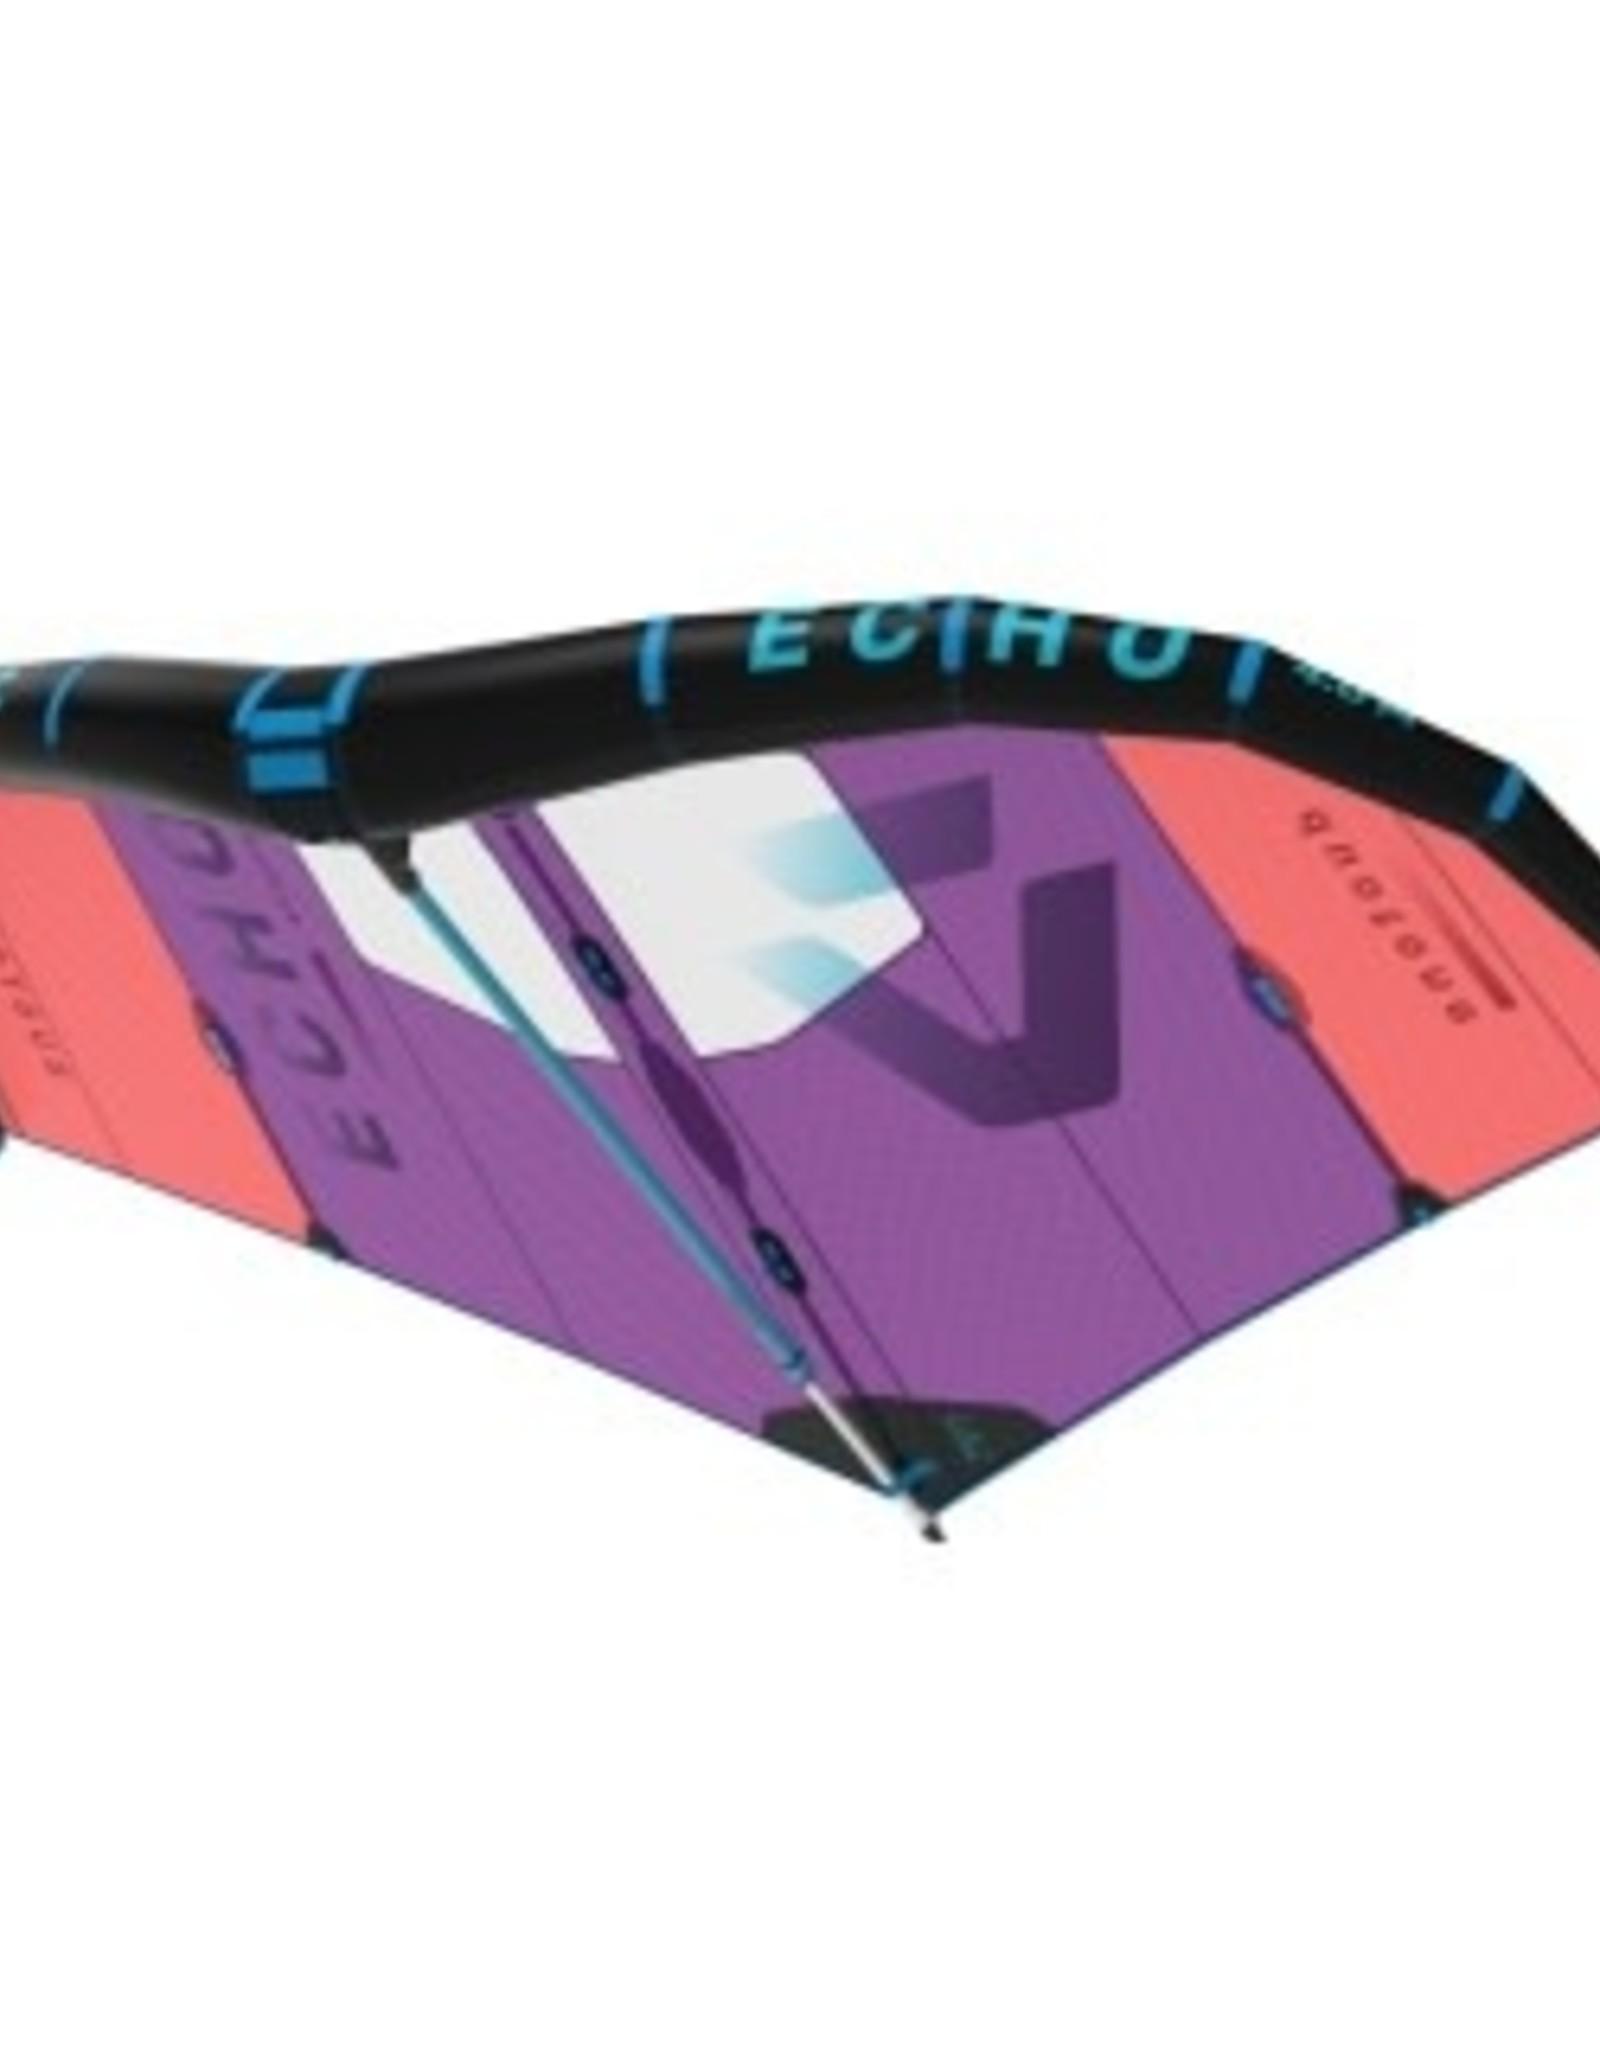 Duotone Duotone ECHO 4m red/purple